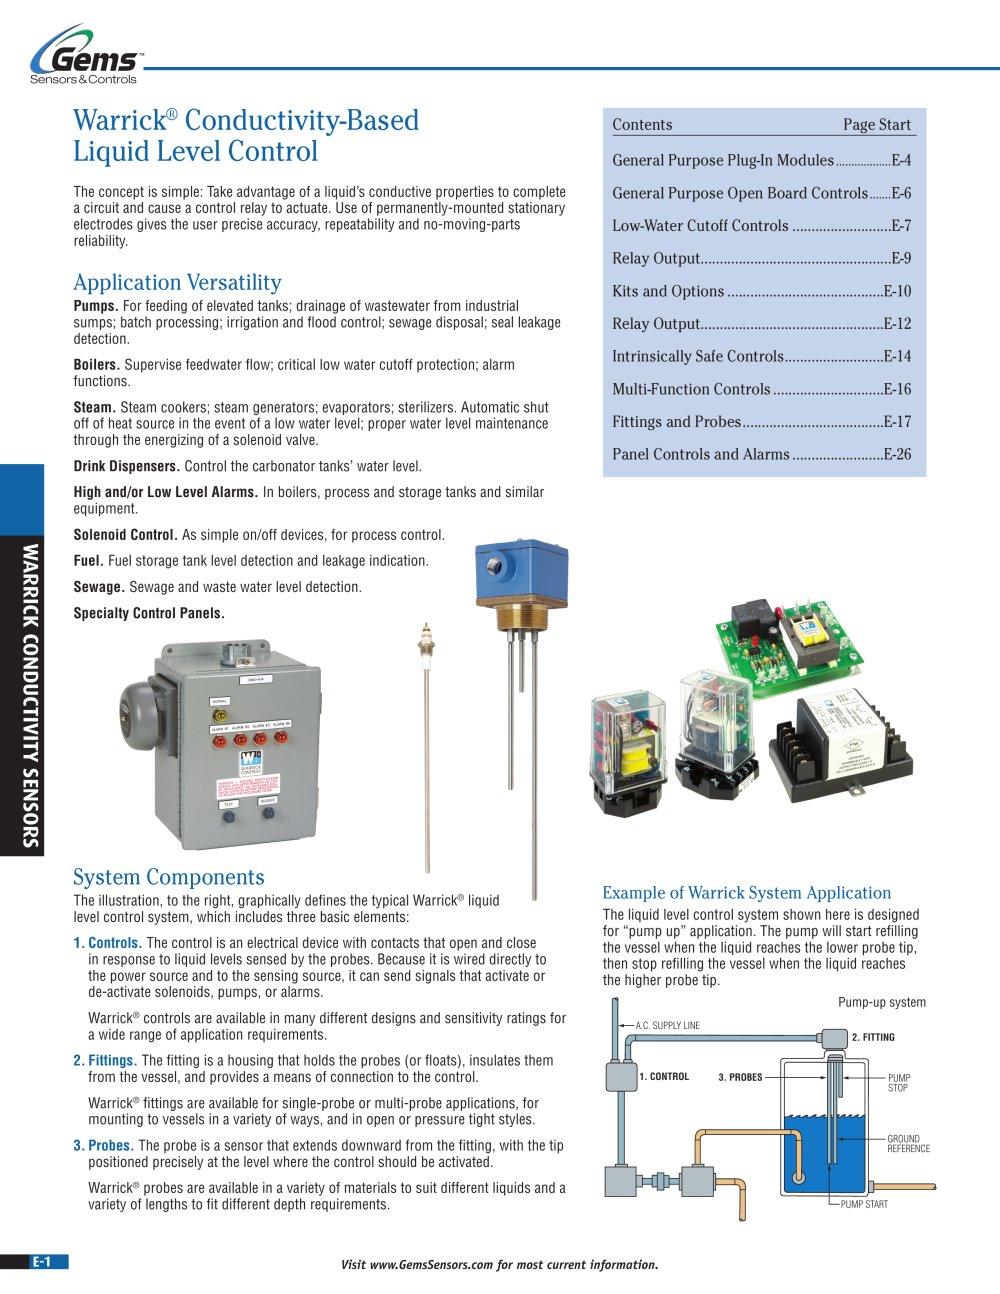 Conductivity Sensor Wiring Diagram 34 Images Water Level Warrick Sensors 44325 1b Gems Pdf Catalogues Probe At